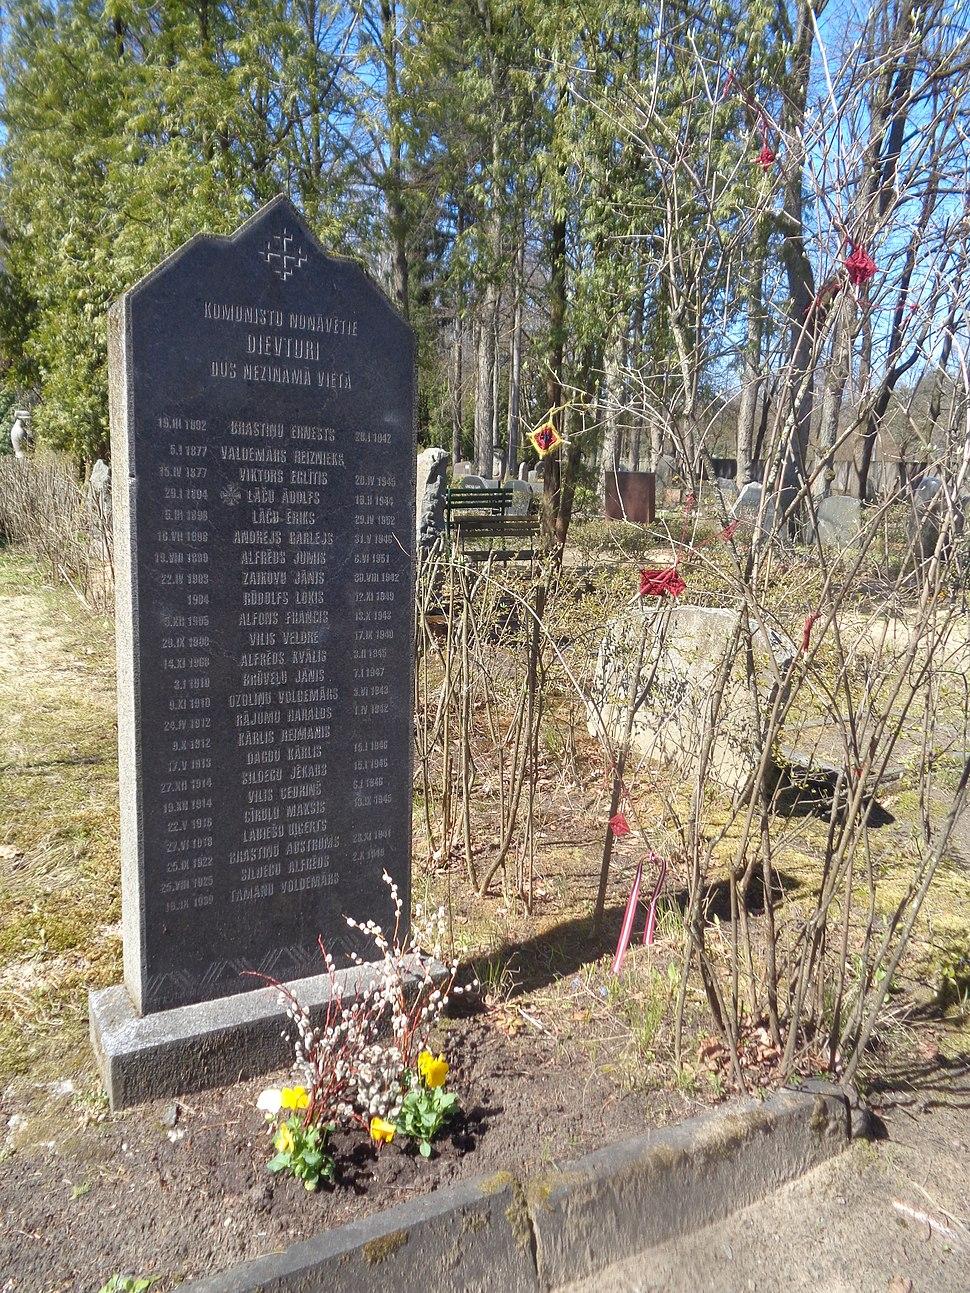 Memorial for Dievturi (Latvian pagan) victims of Soviet rule 1942-1952, Forest Cemetery, Riga, Latvia